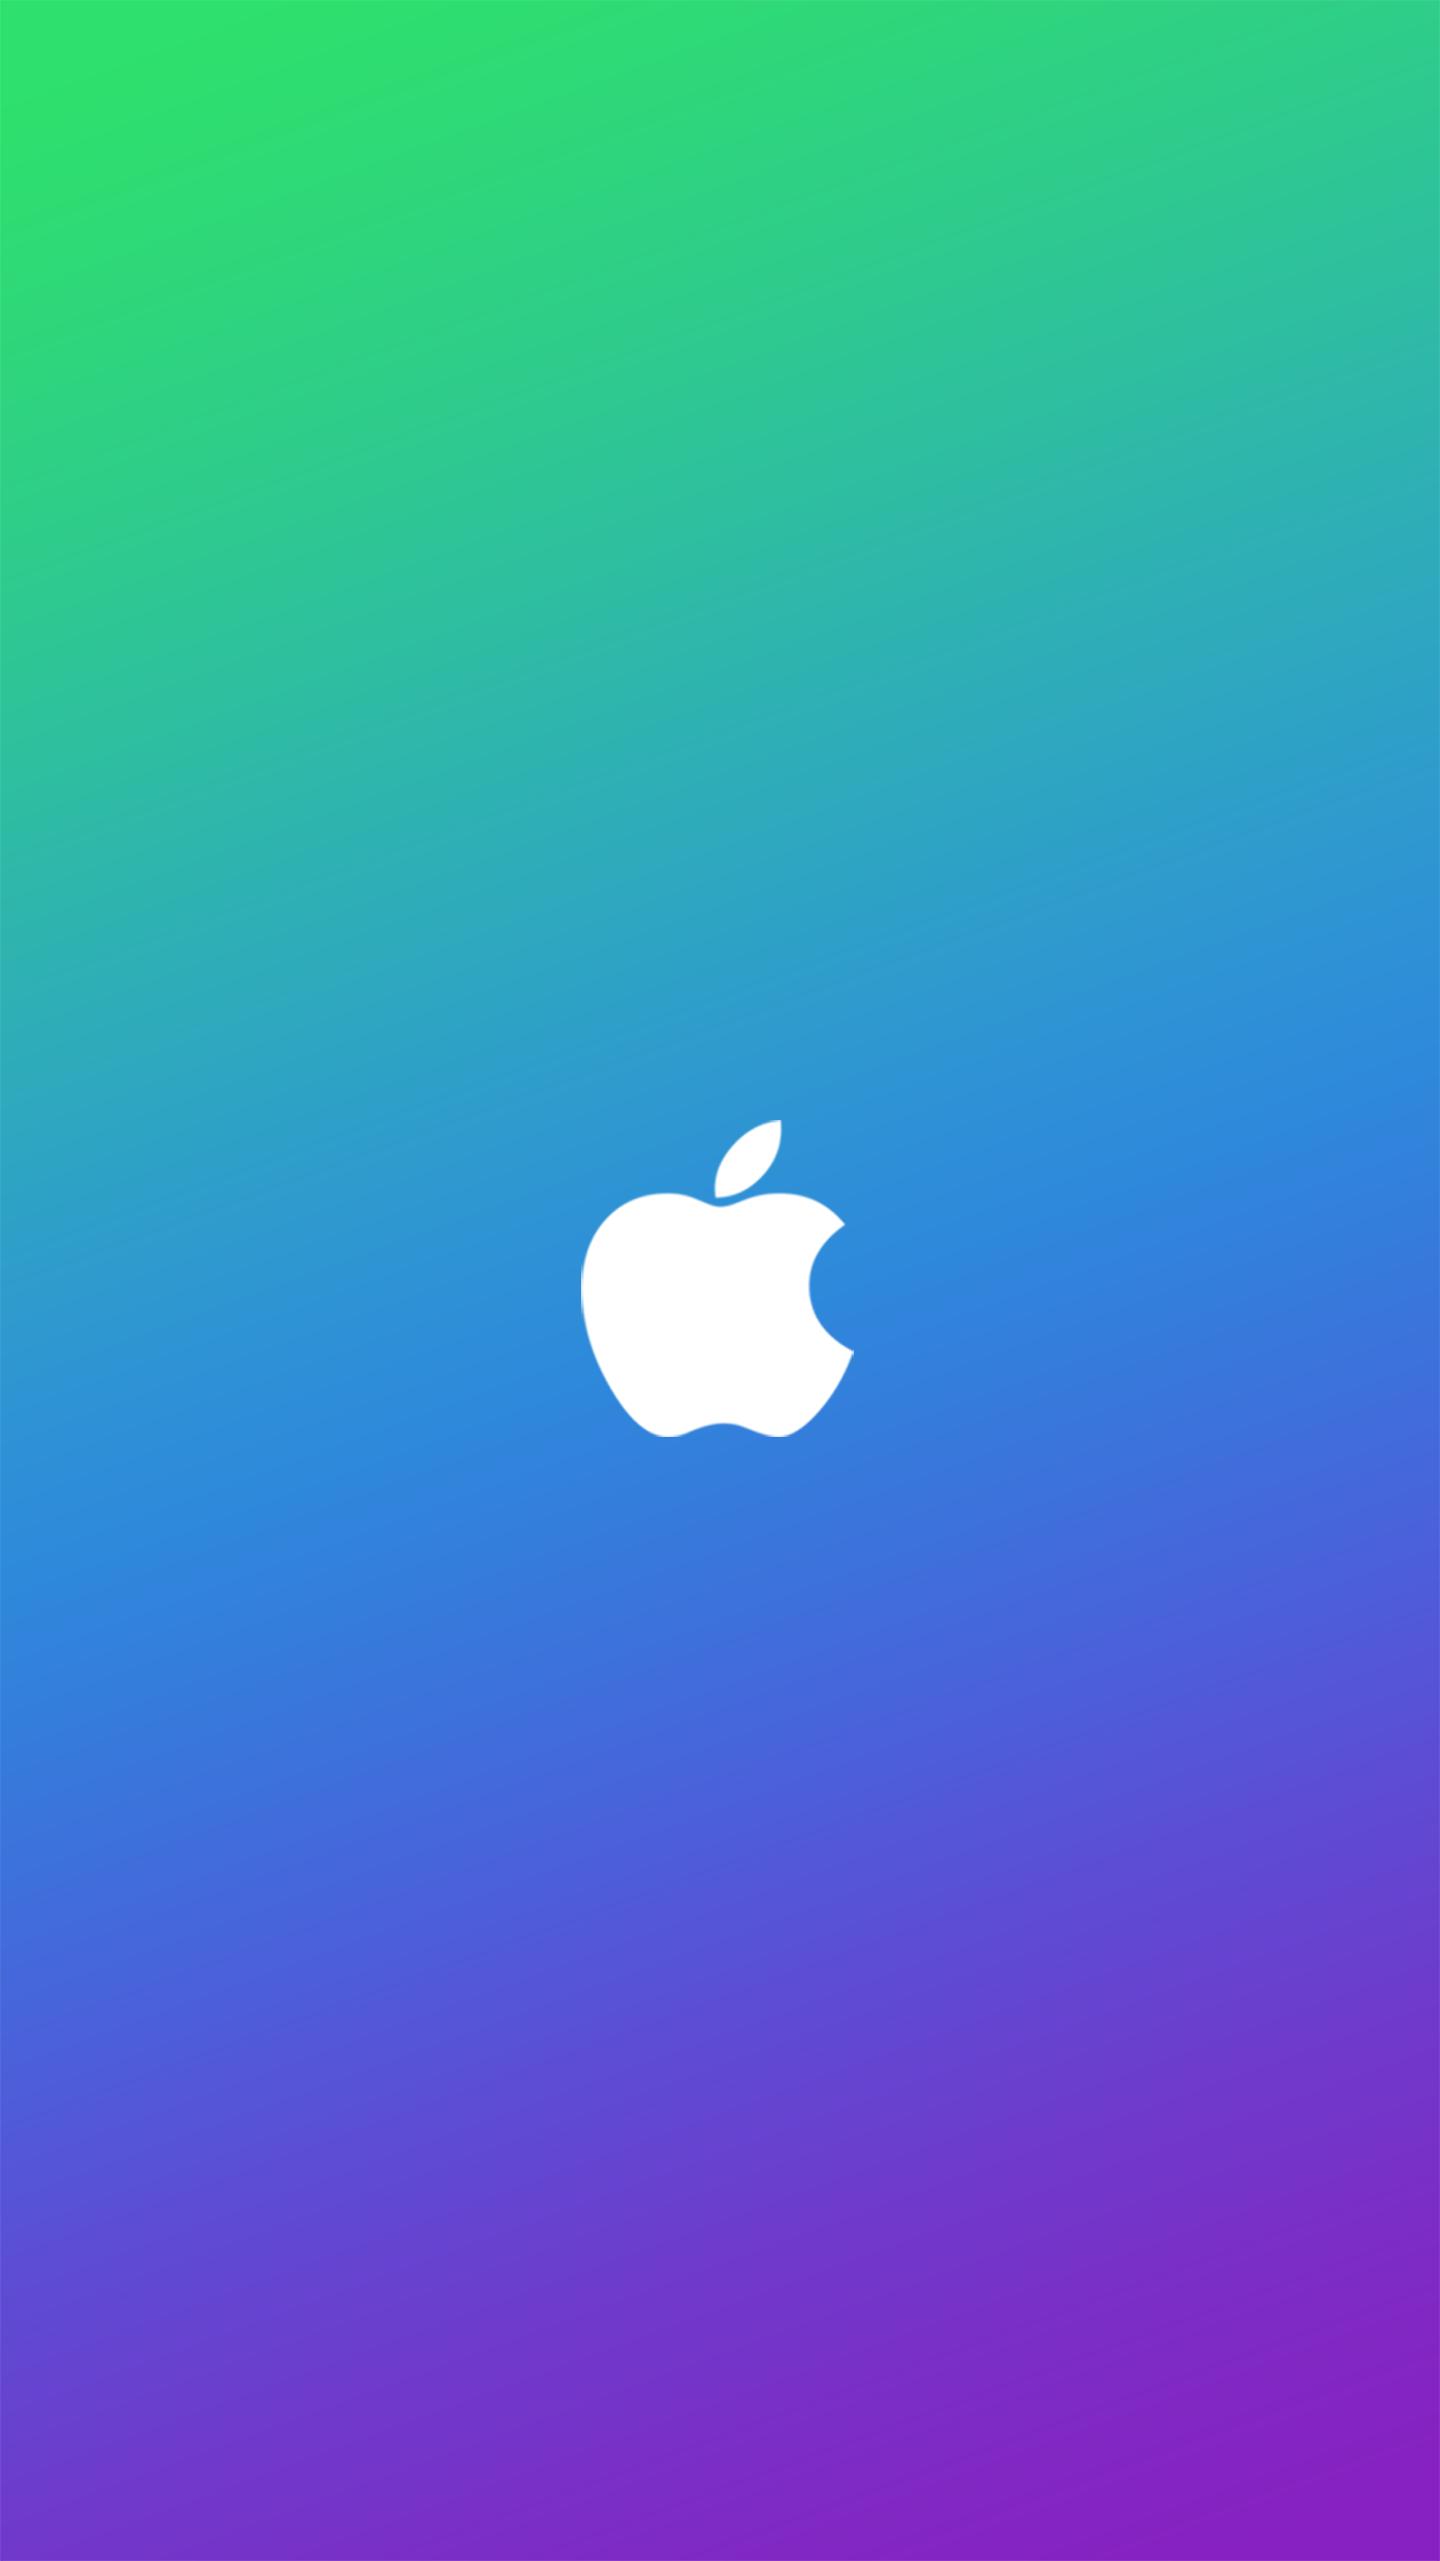 Wallpaper Iphone Color In 2020 Apple Logo Wallpaper Iphone Color Wallpaper Iphone Pink Wallpaper Iphone